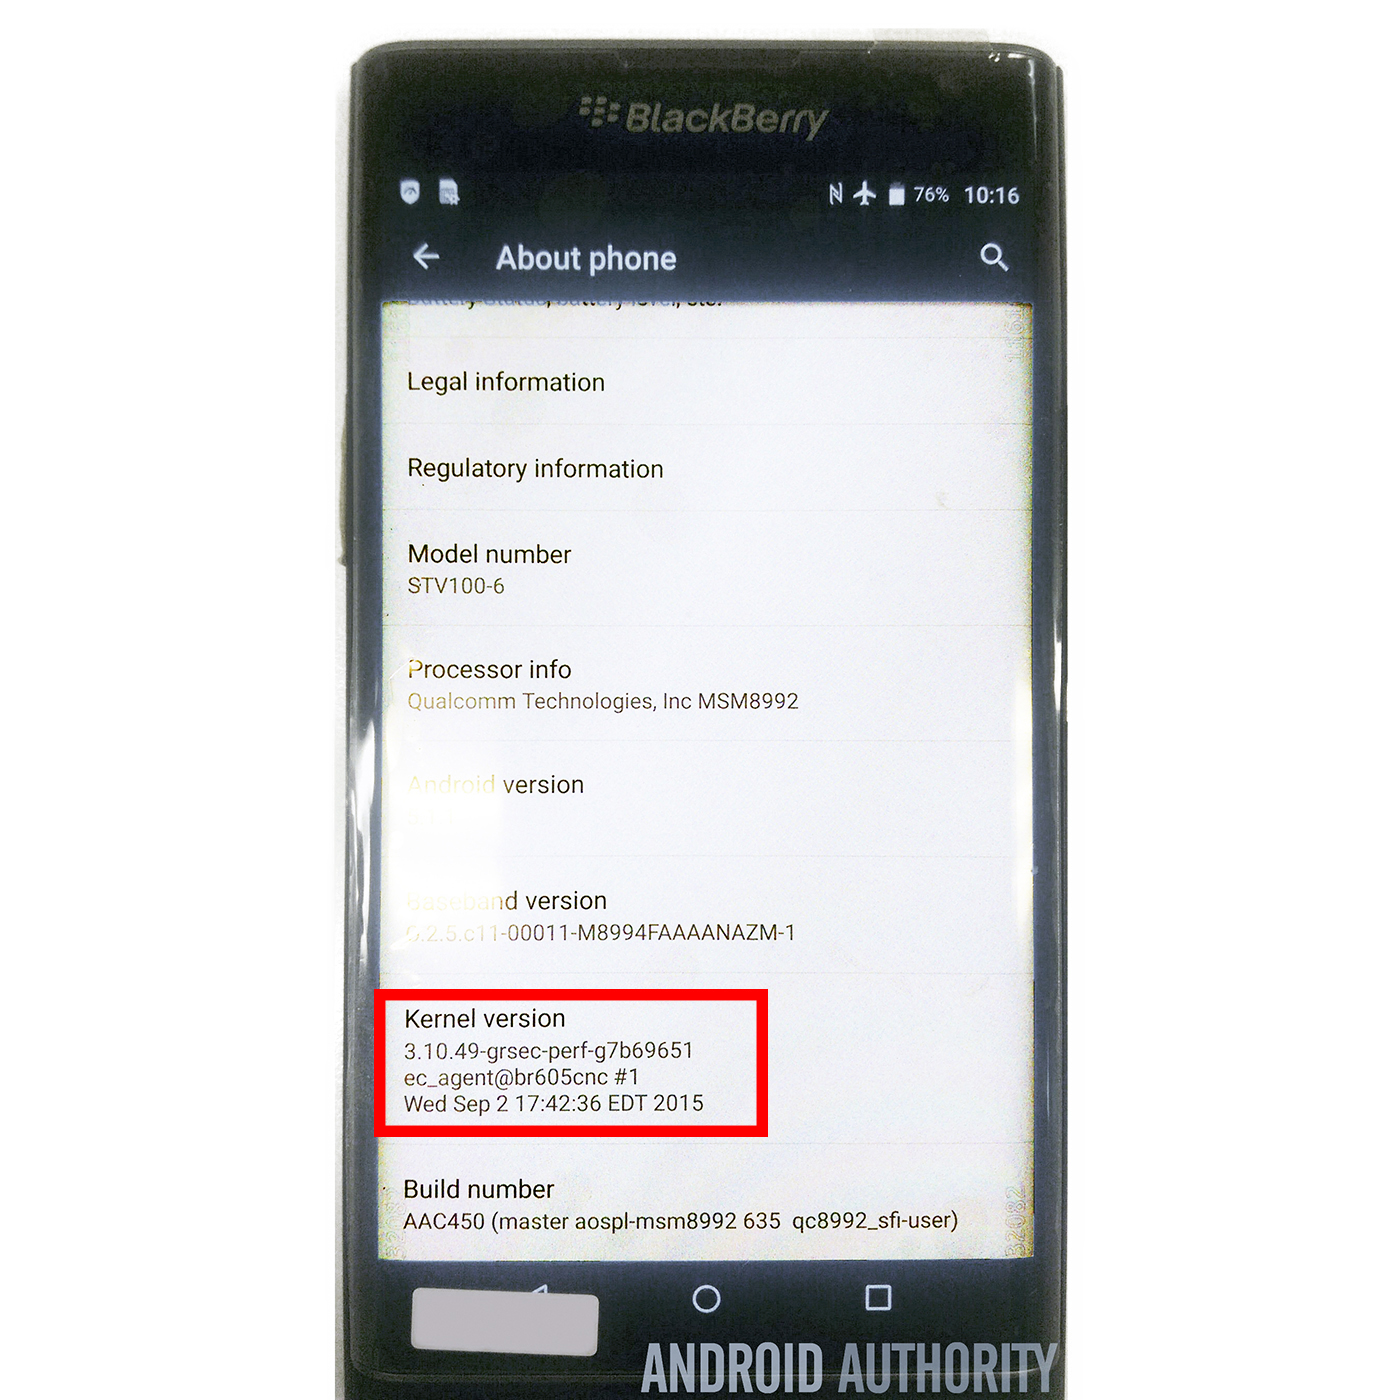 blackberry-venice-leak-2 copy copy